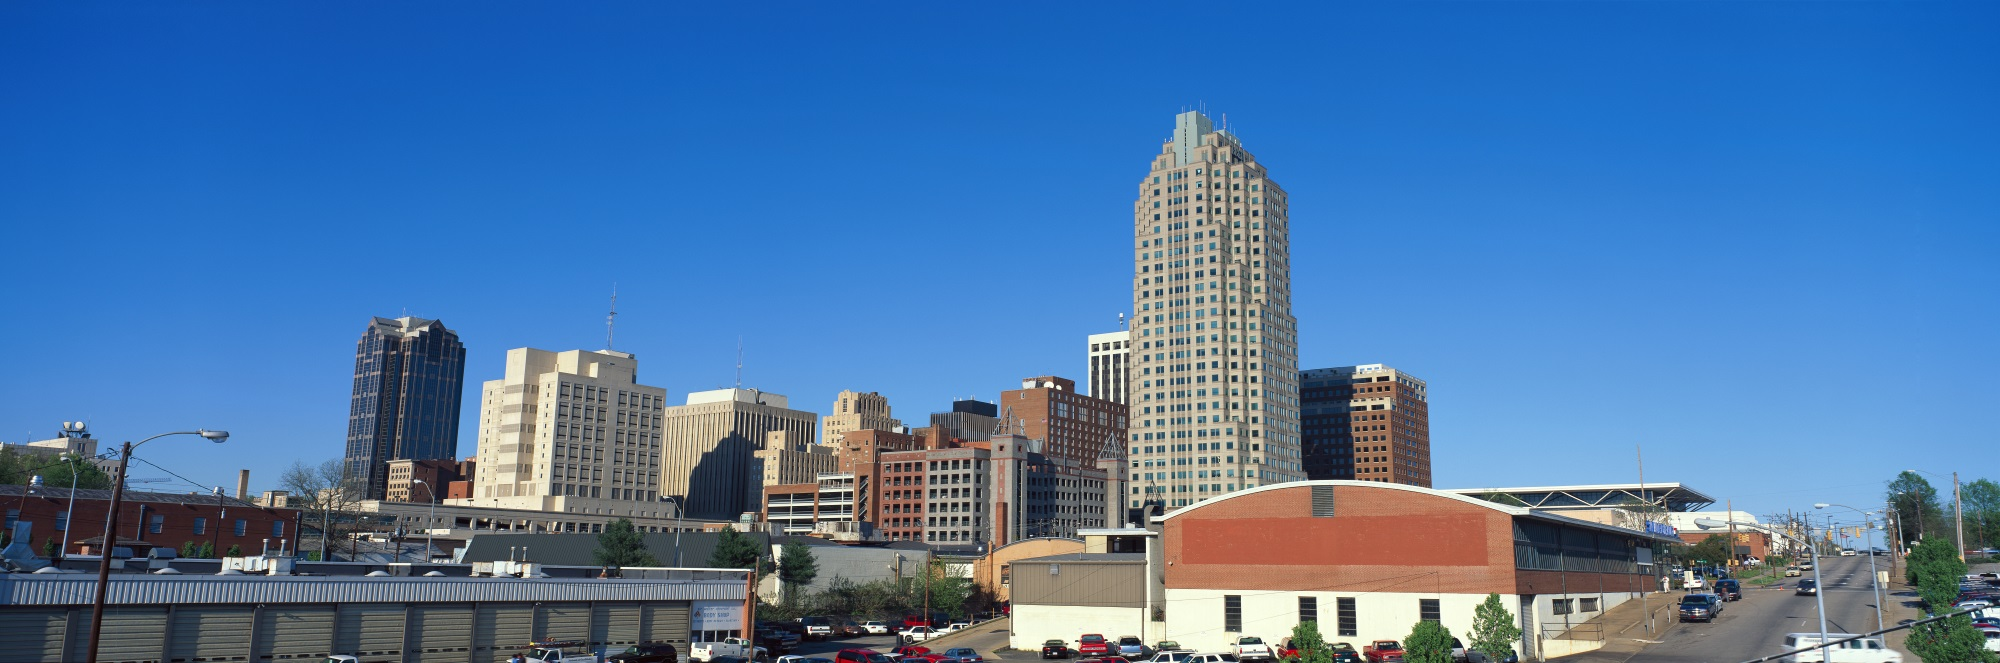 Memphis Panorama